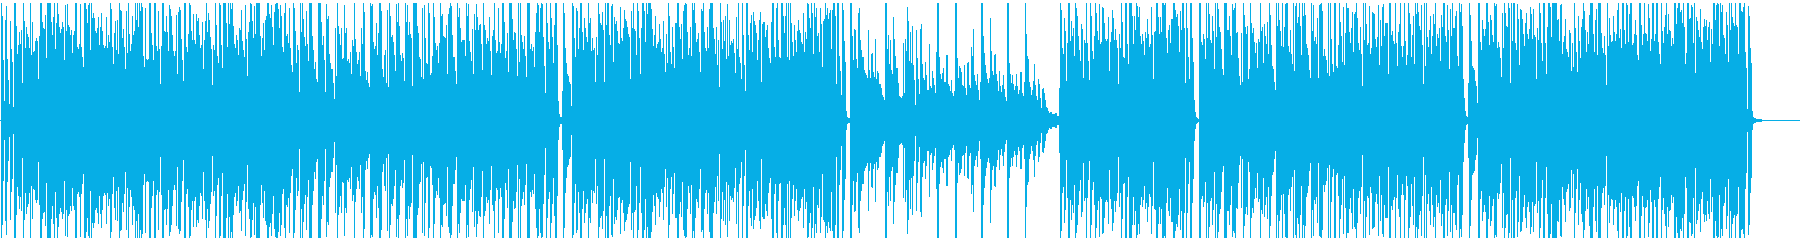 STEM -ドラム抜きの再生済みの波形